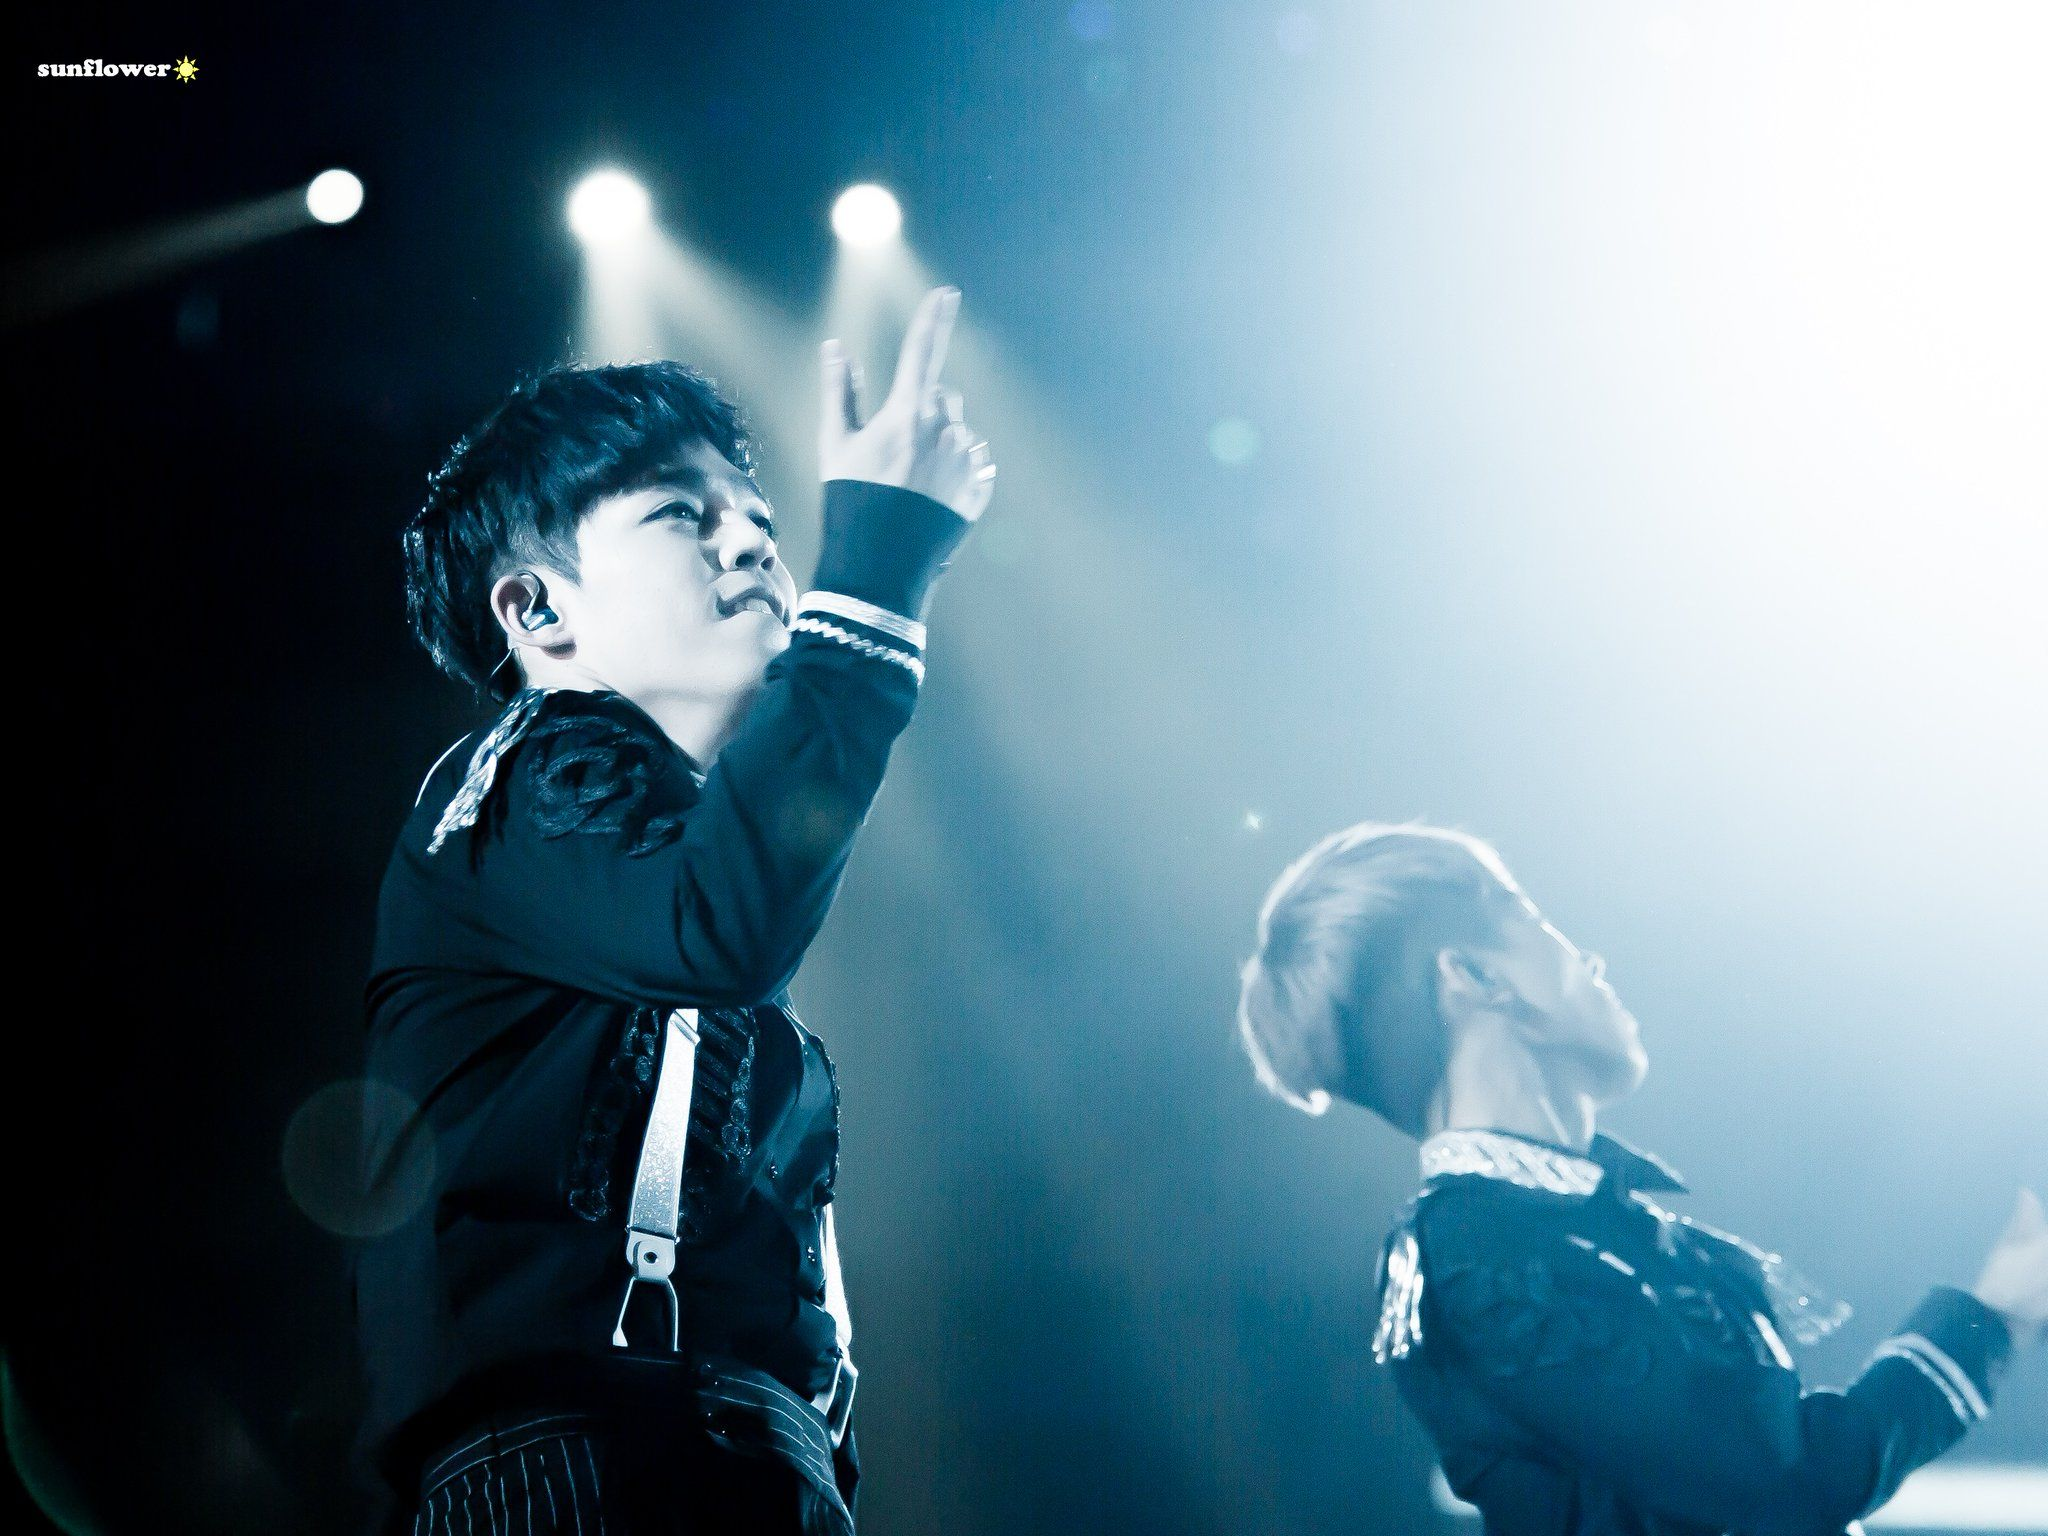 "Sunflower on Twitter: ""【Pic】161127 슈퍼서울드림콘서트 #에스쿱스 #SCOUPS #세븐틴 #SEVENTEEN https://t.co/6uoUoWTnZb"""